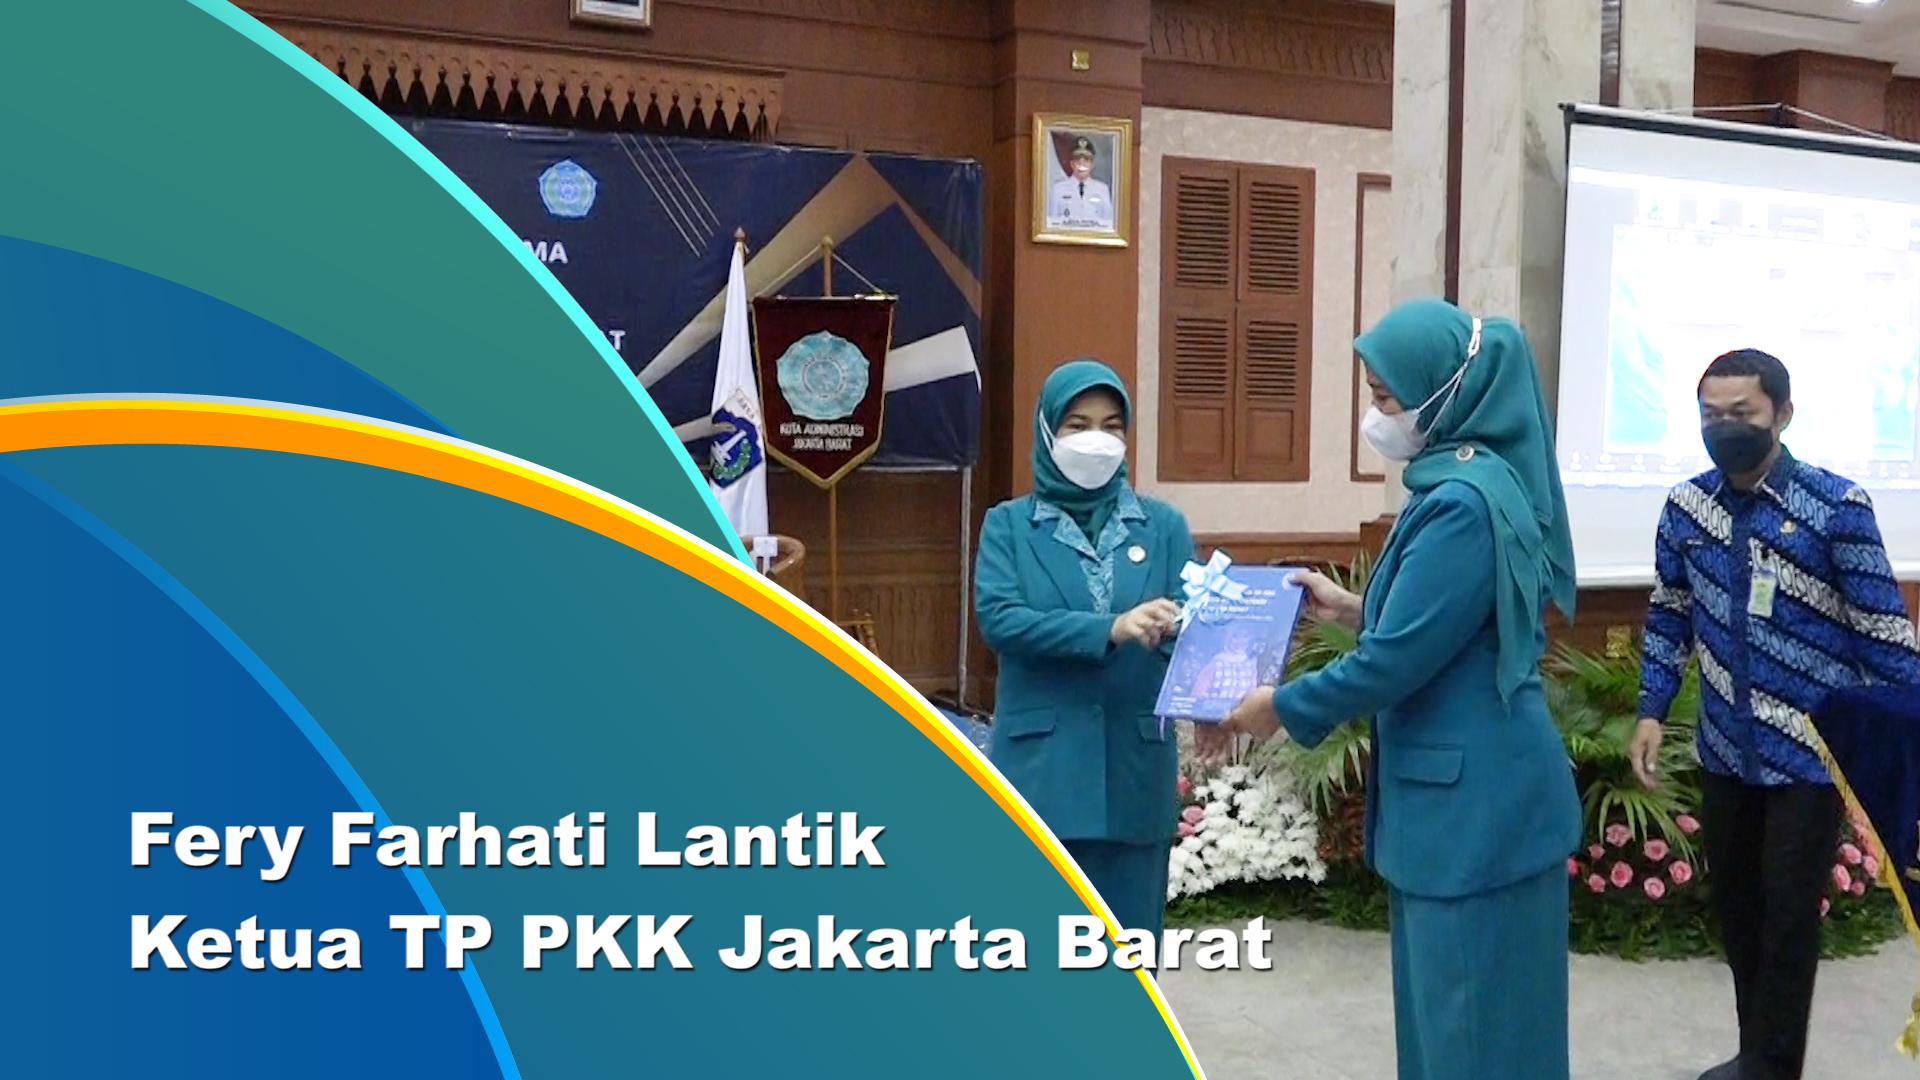 Ketua TP PKK Jakarta Barat Dilantik